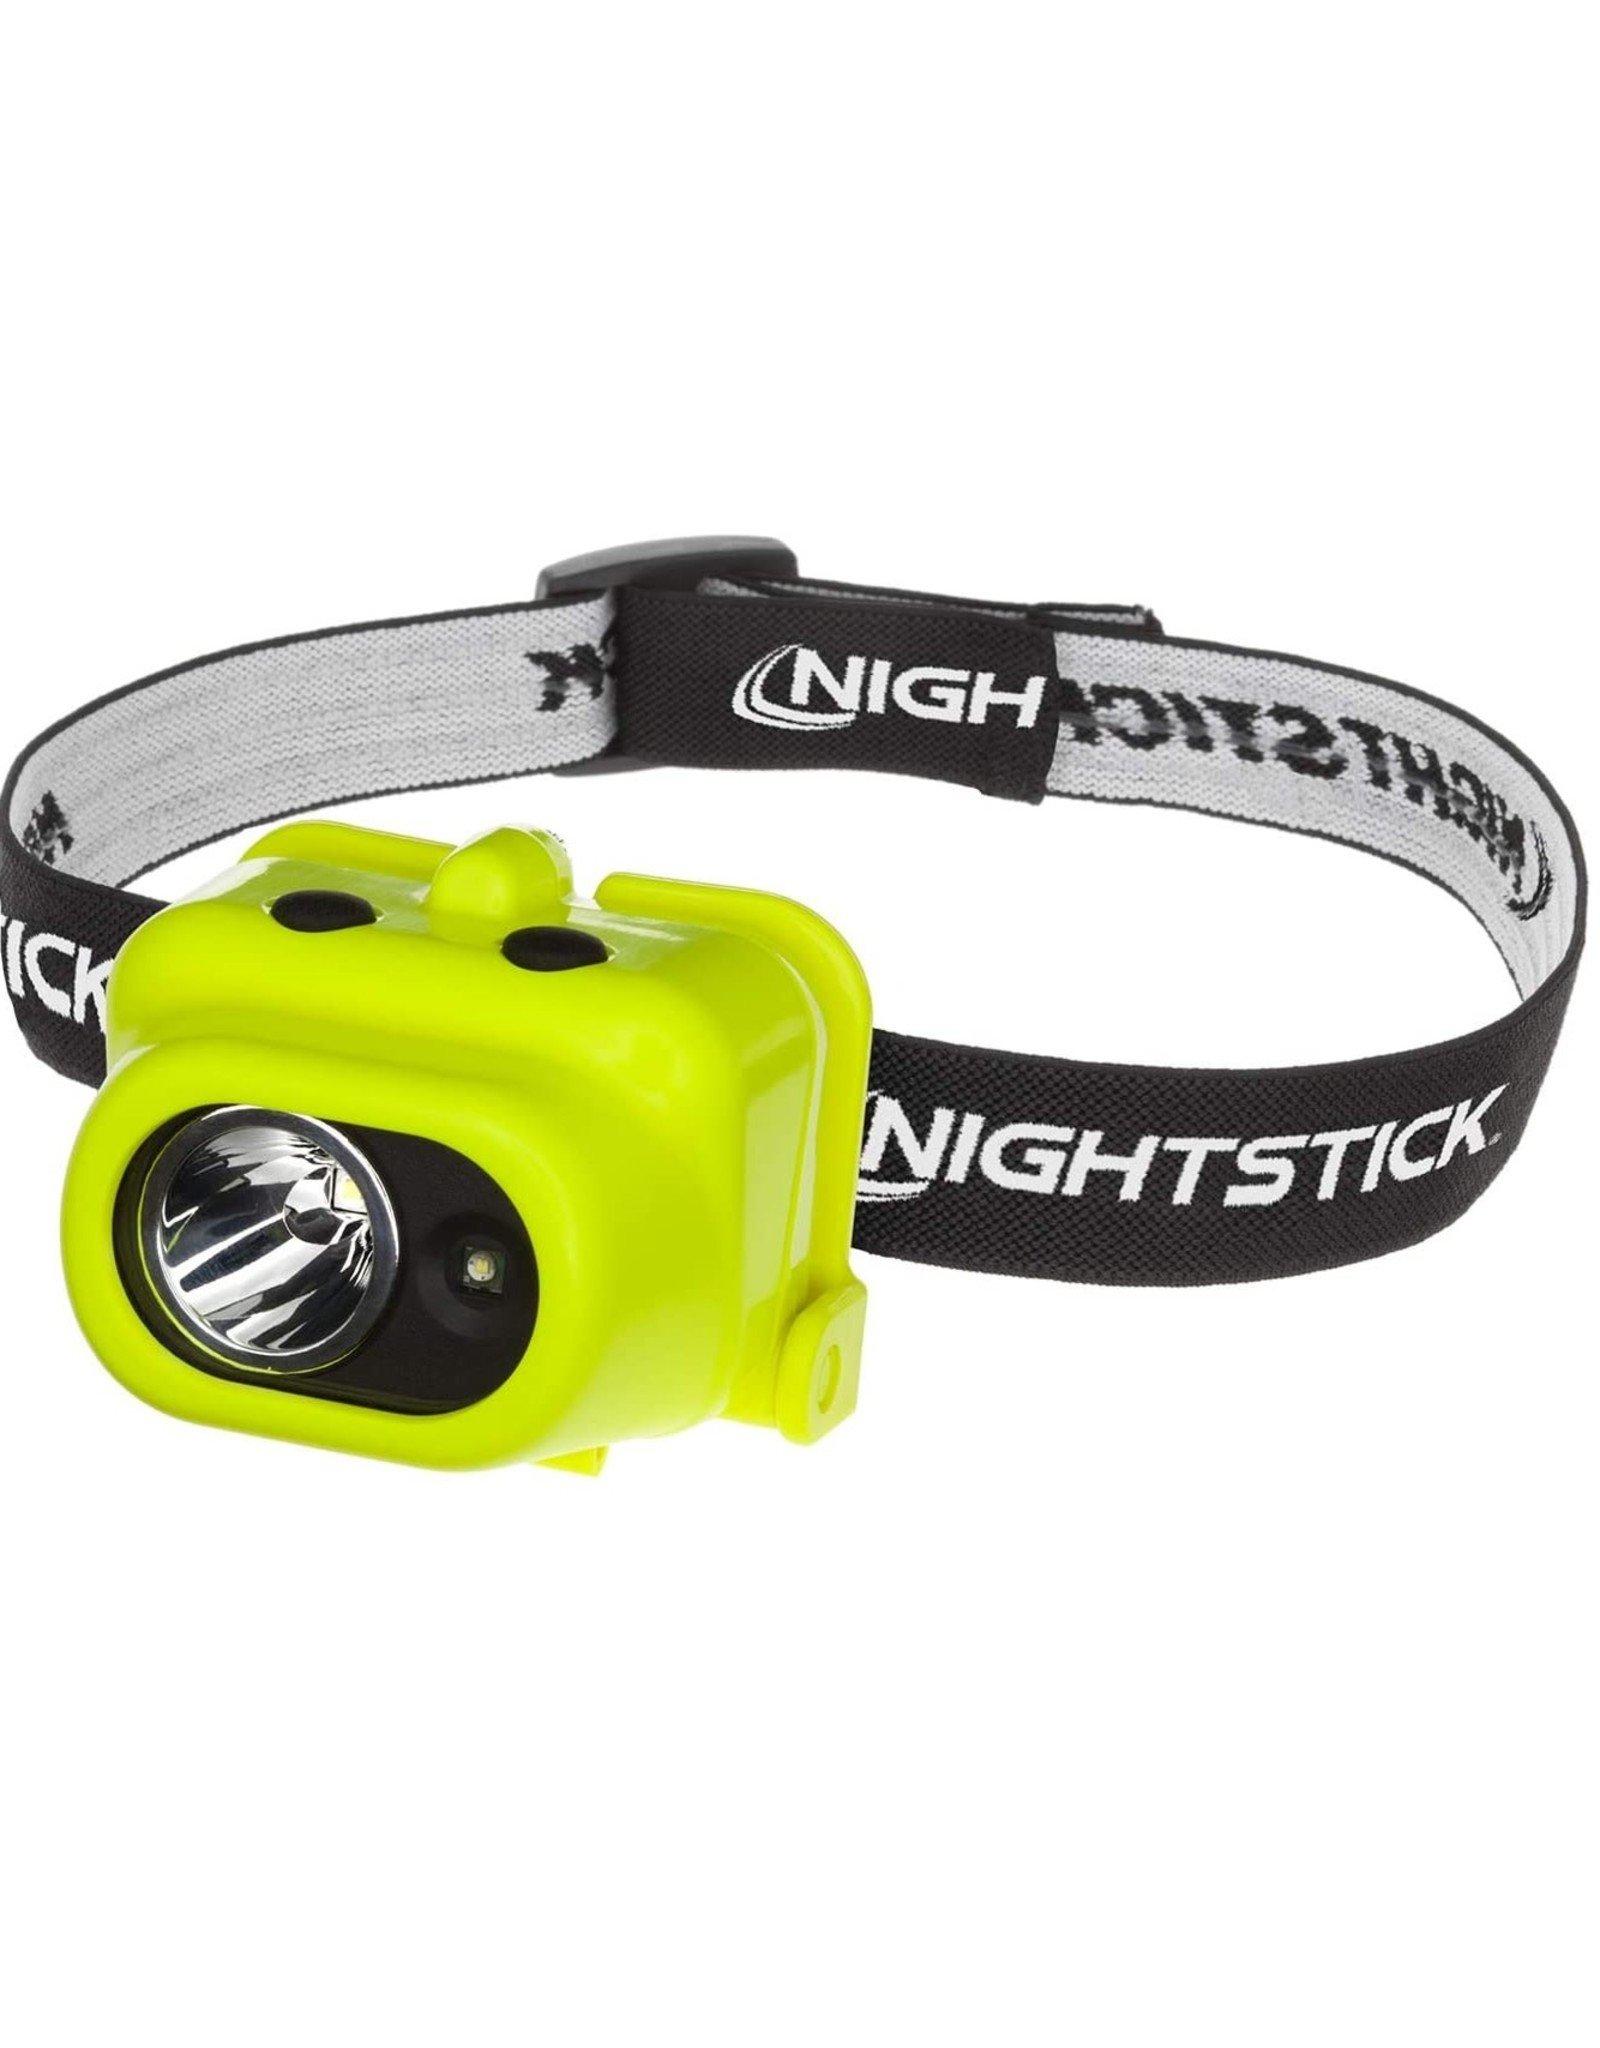 Bayco Intrinsically Safe Dual Light Headlamp Nightstick